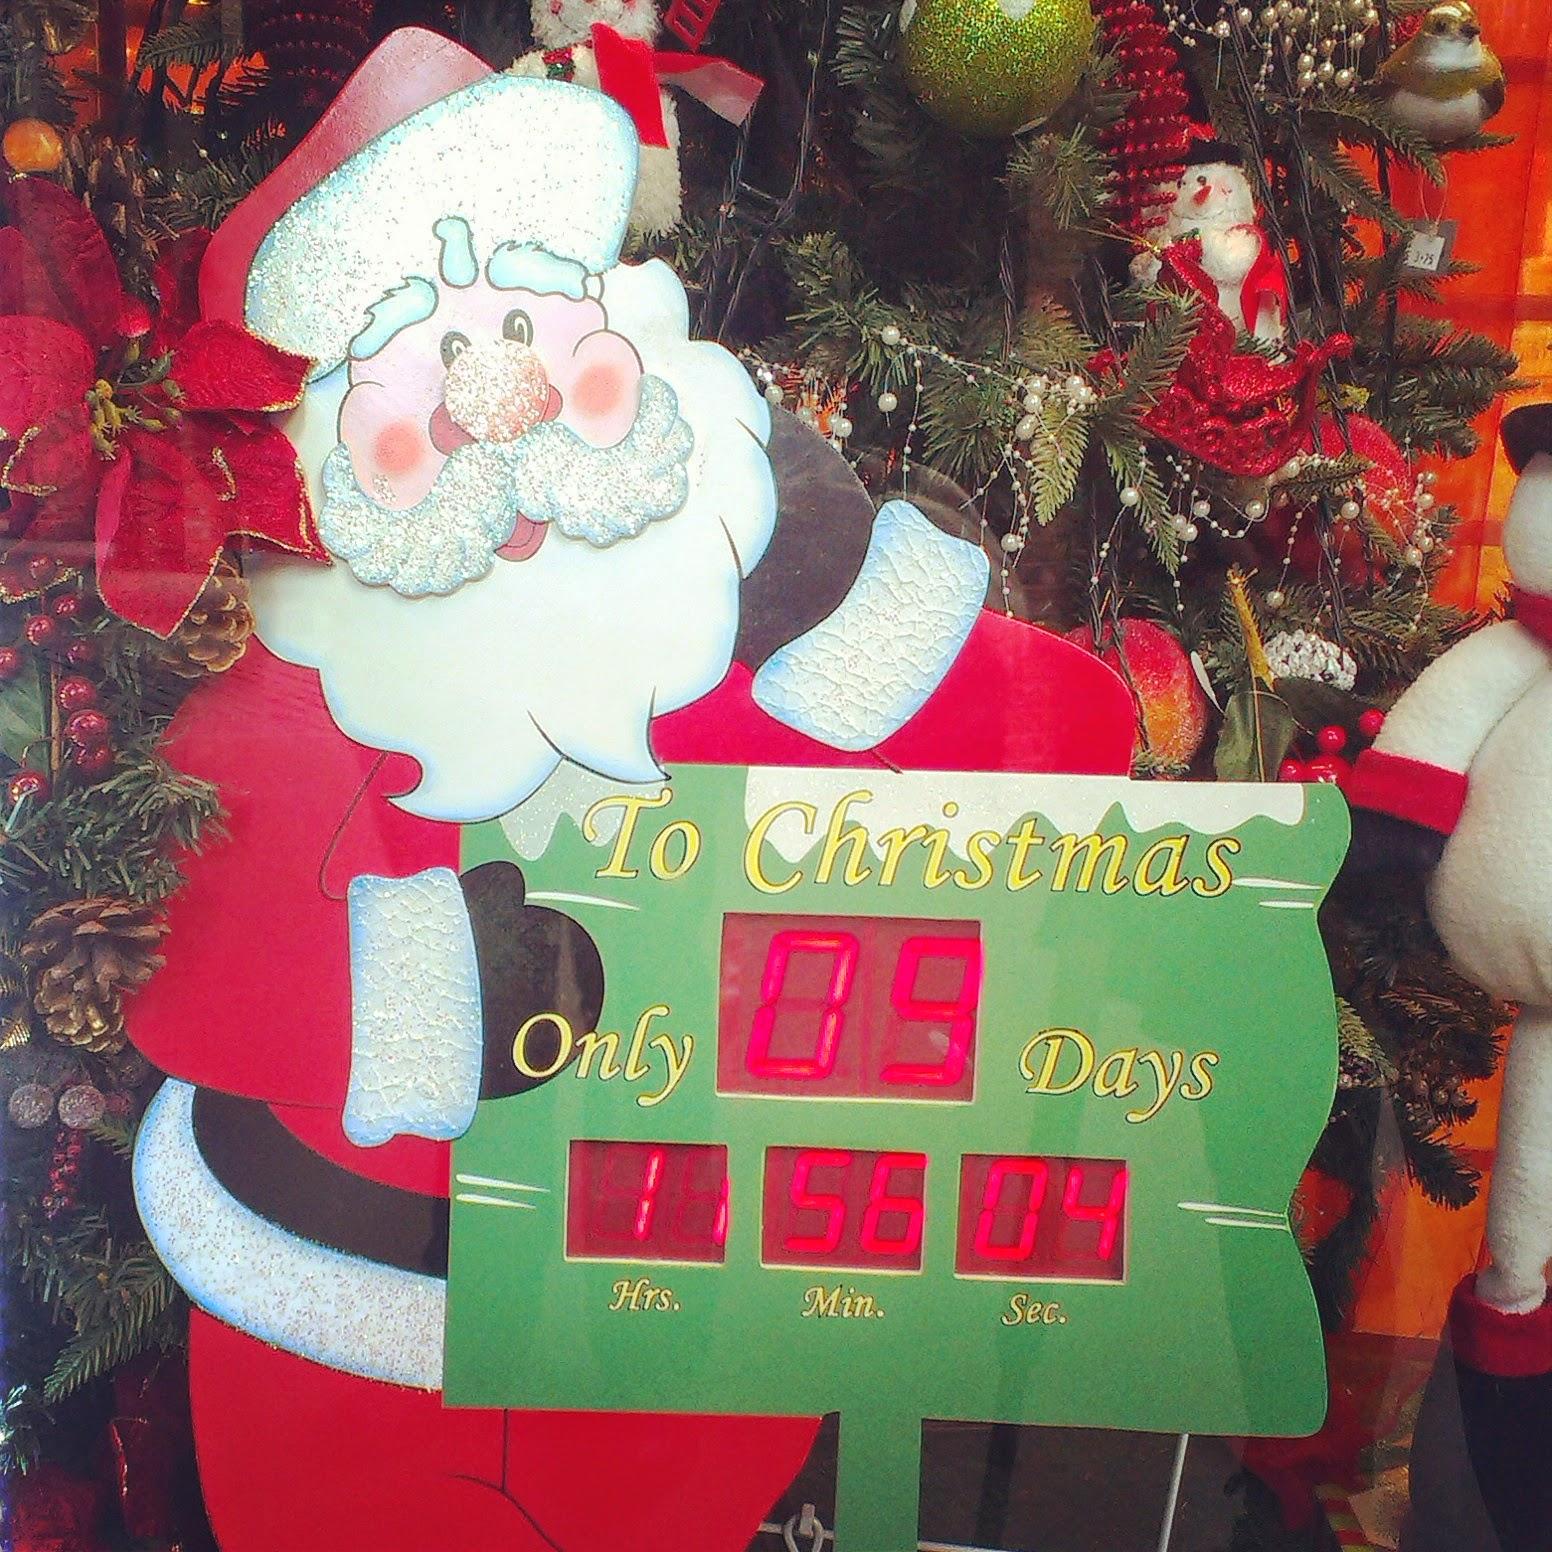 Days left till Christmas